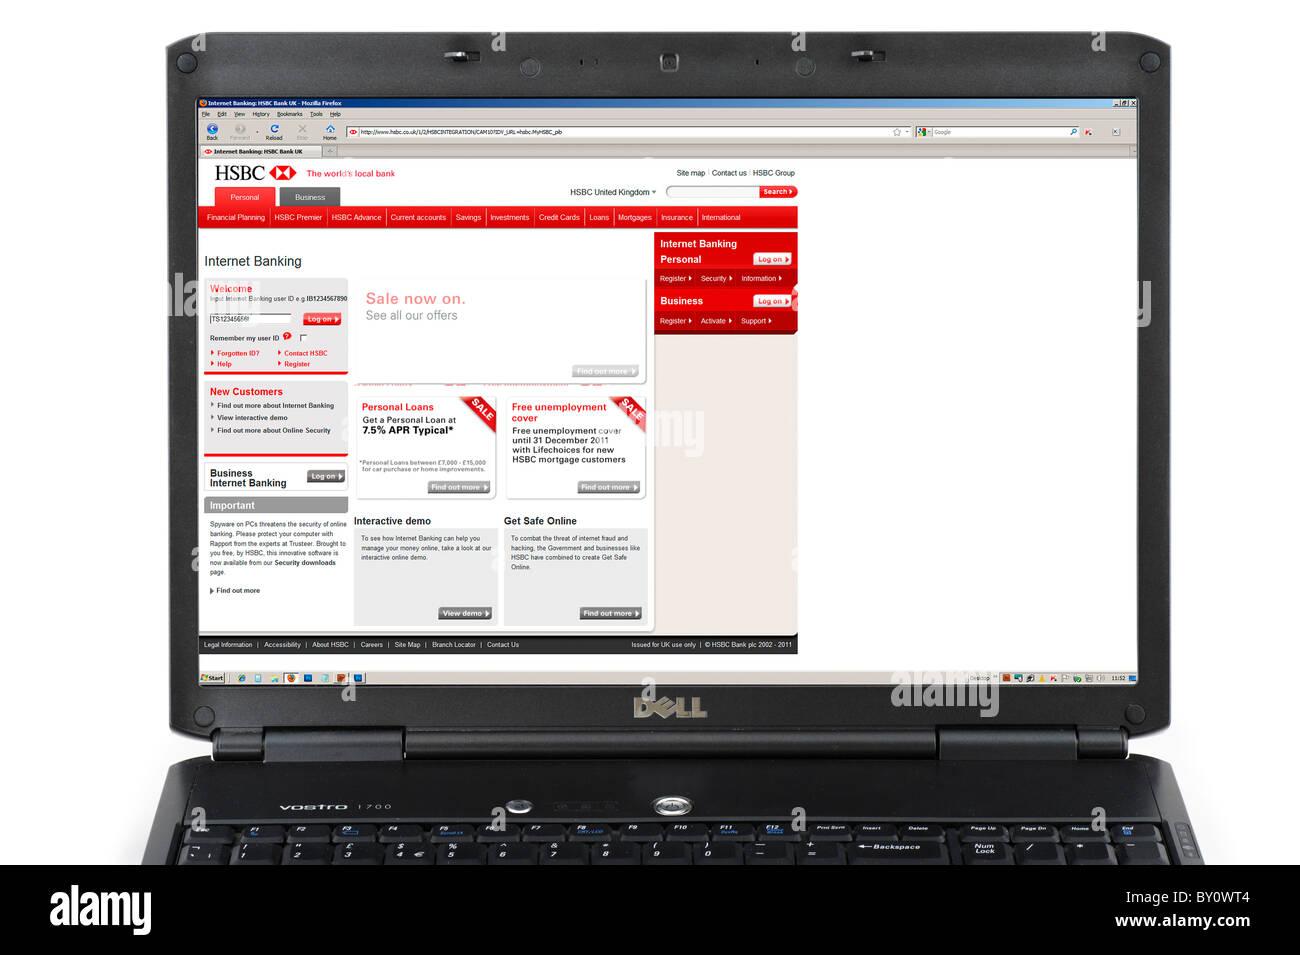 Logging on to HSBC online banking, UK Stock Photo: 33826356 - Alamy